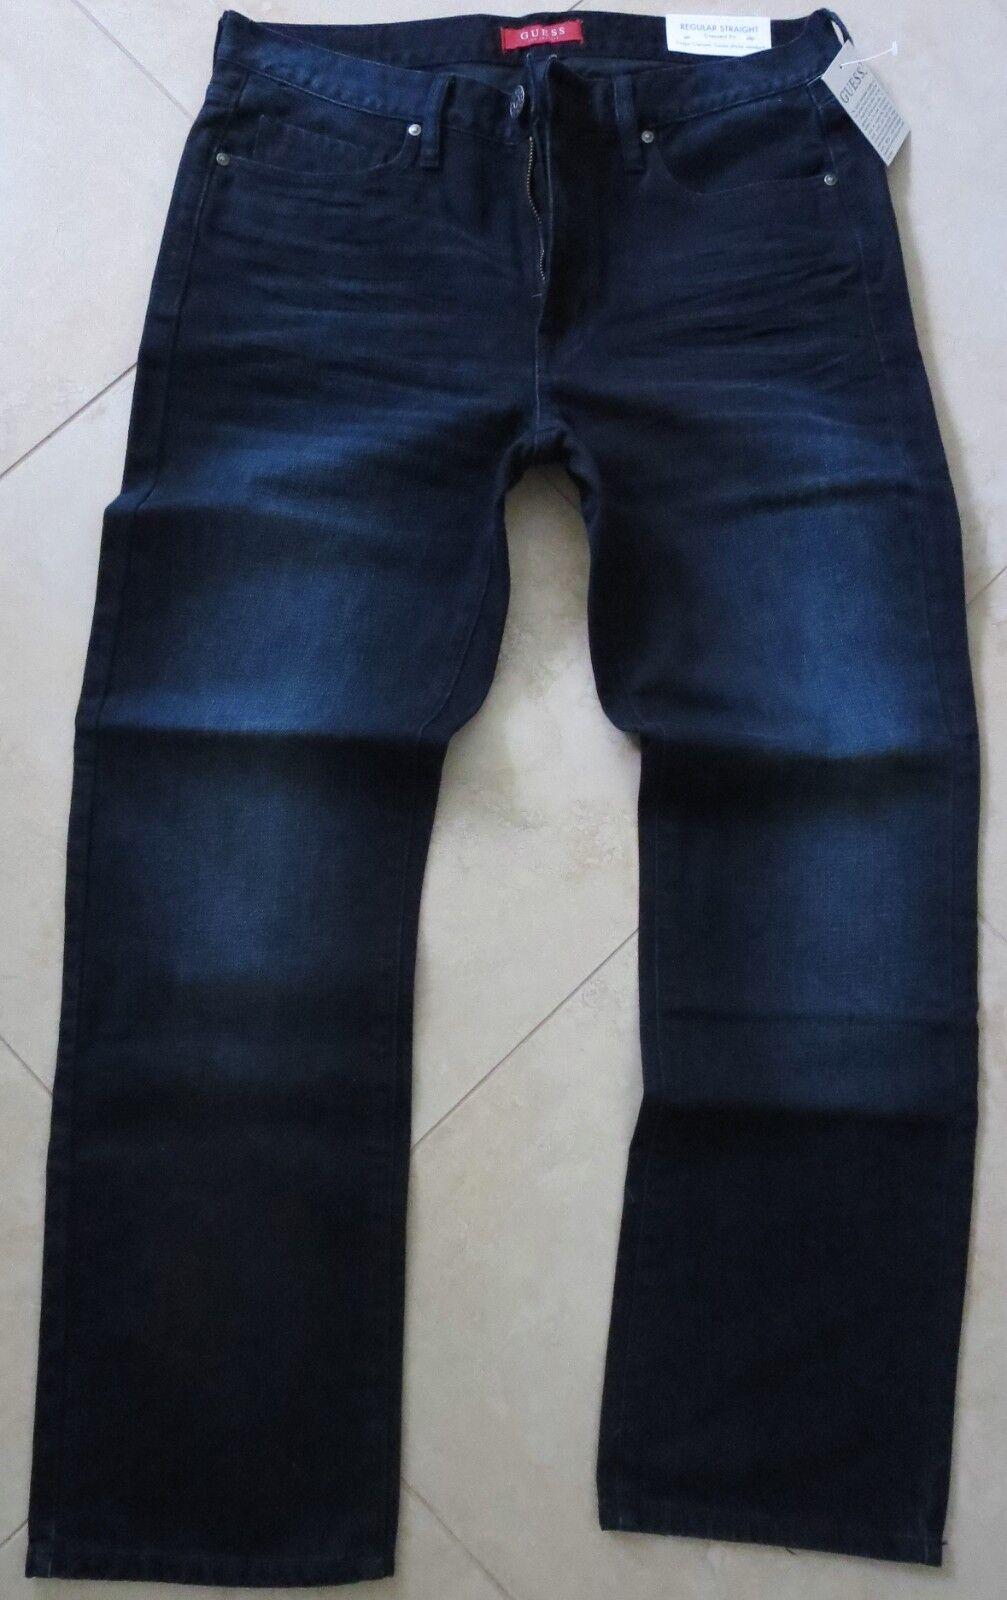 Guess Straight Leg Jeans Men's Size 40 X 32 Vintage Distressed Dark Wash